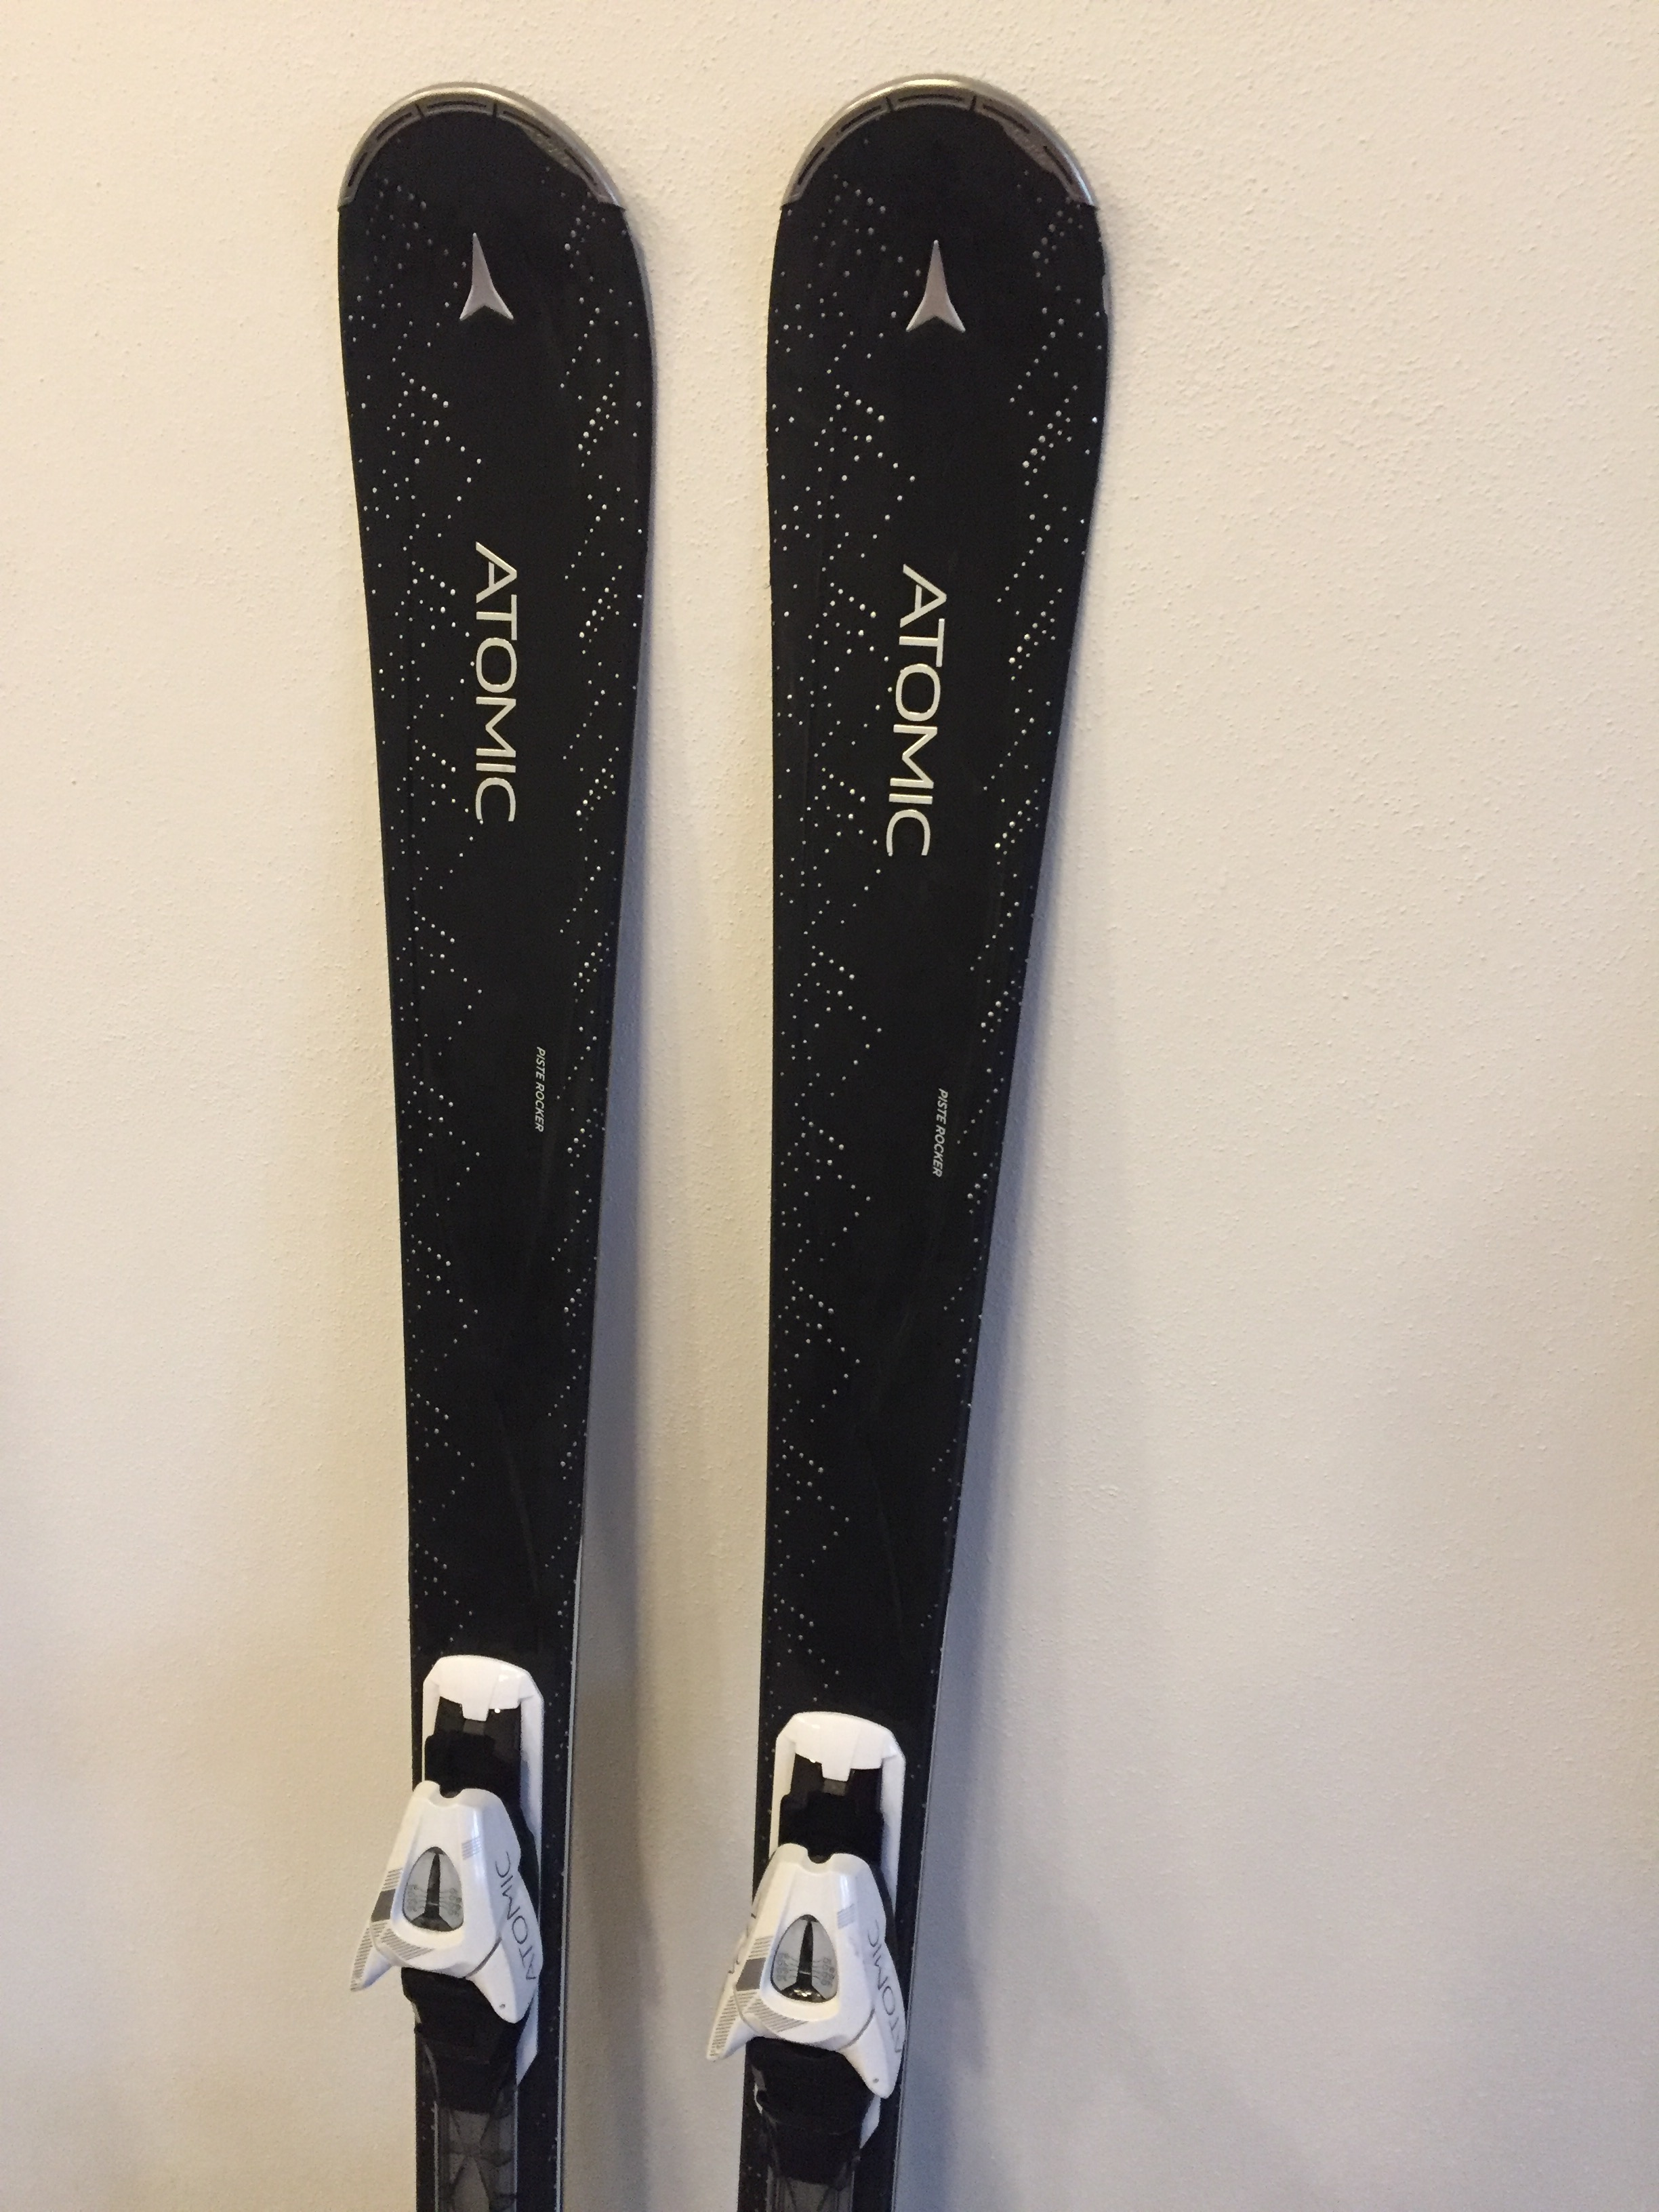 Dámské lyže ATOMIC CLOUD - Bazar - SNOW.CZ b44f29cee1c